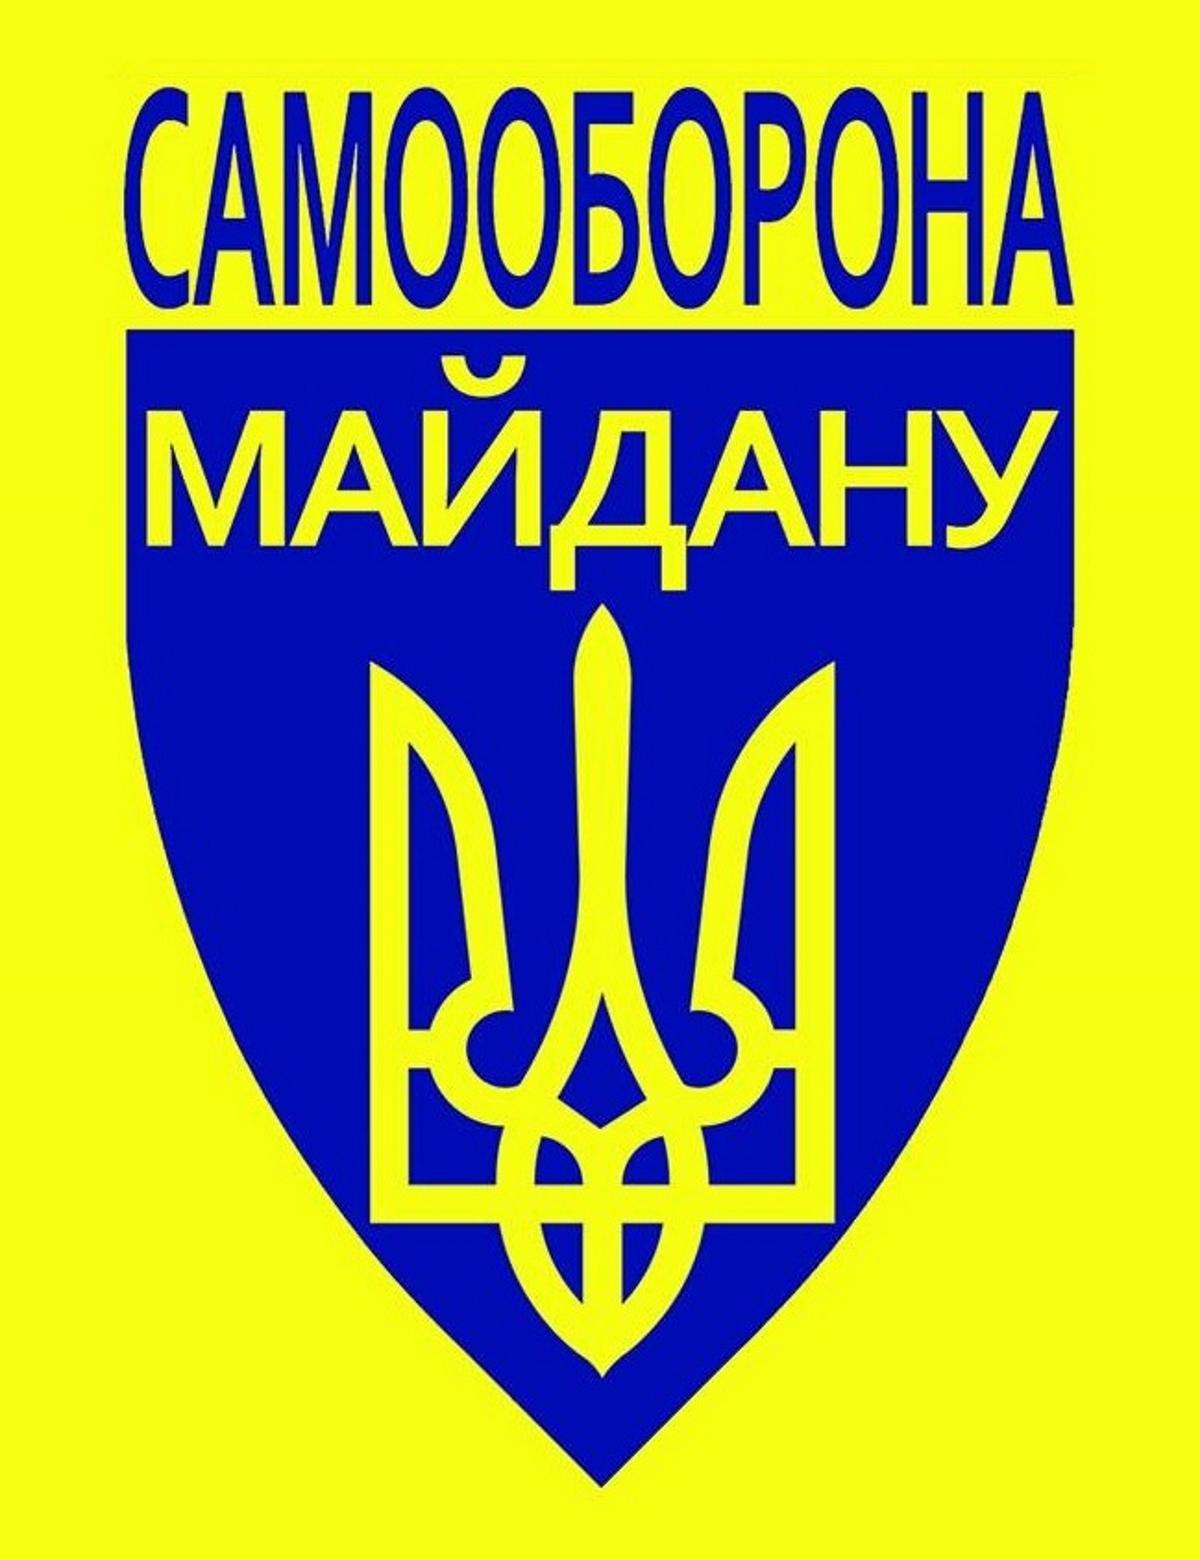 00 Samooborona  Maidan. 27.05.14